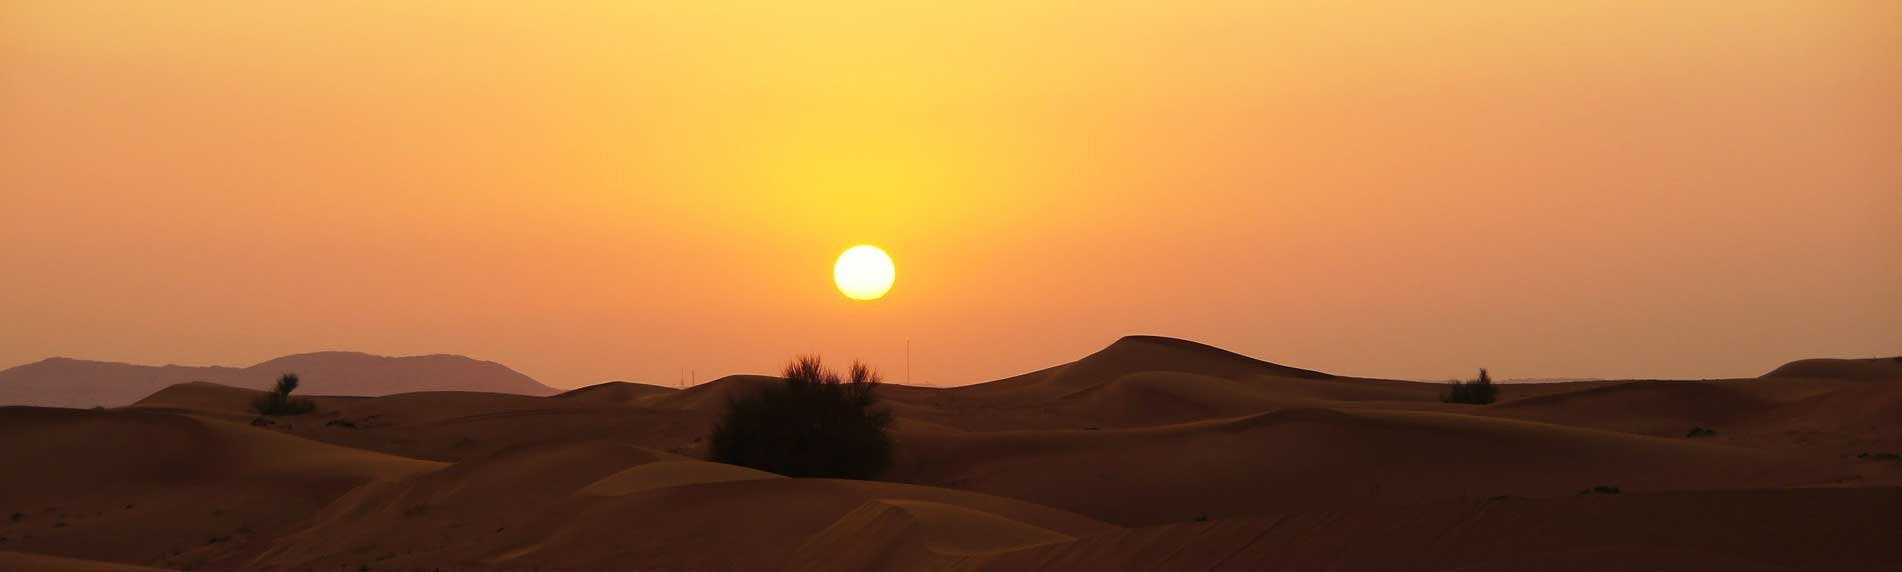 6 Nights Scenic Dubai Package